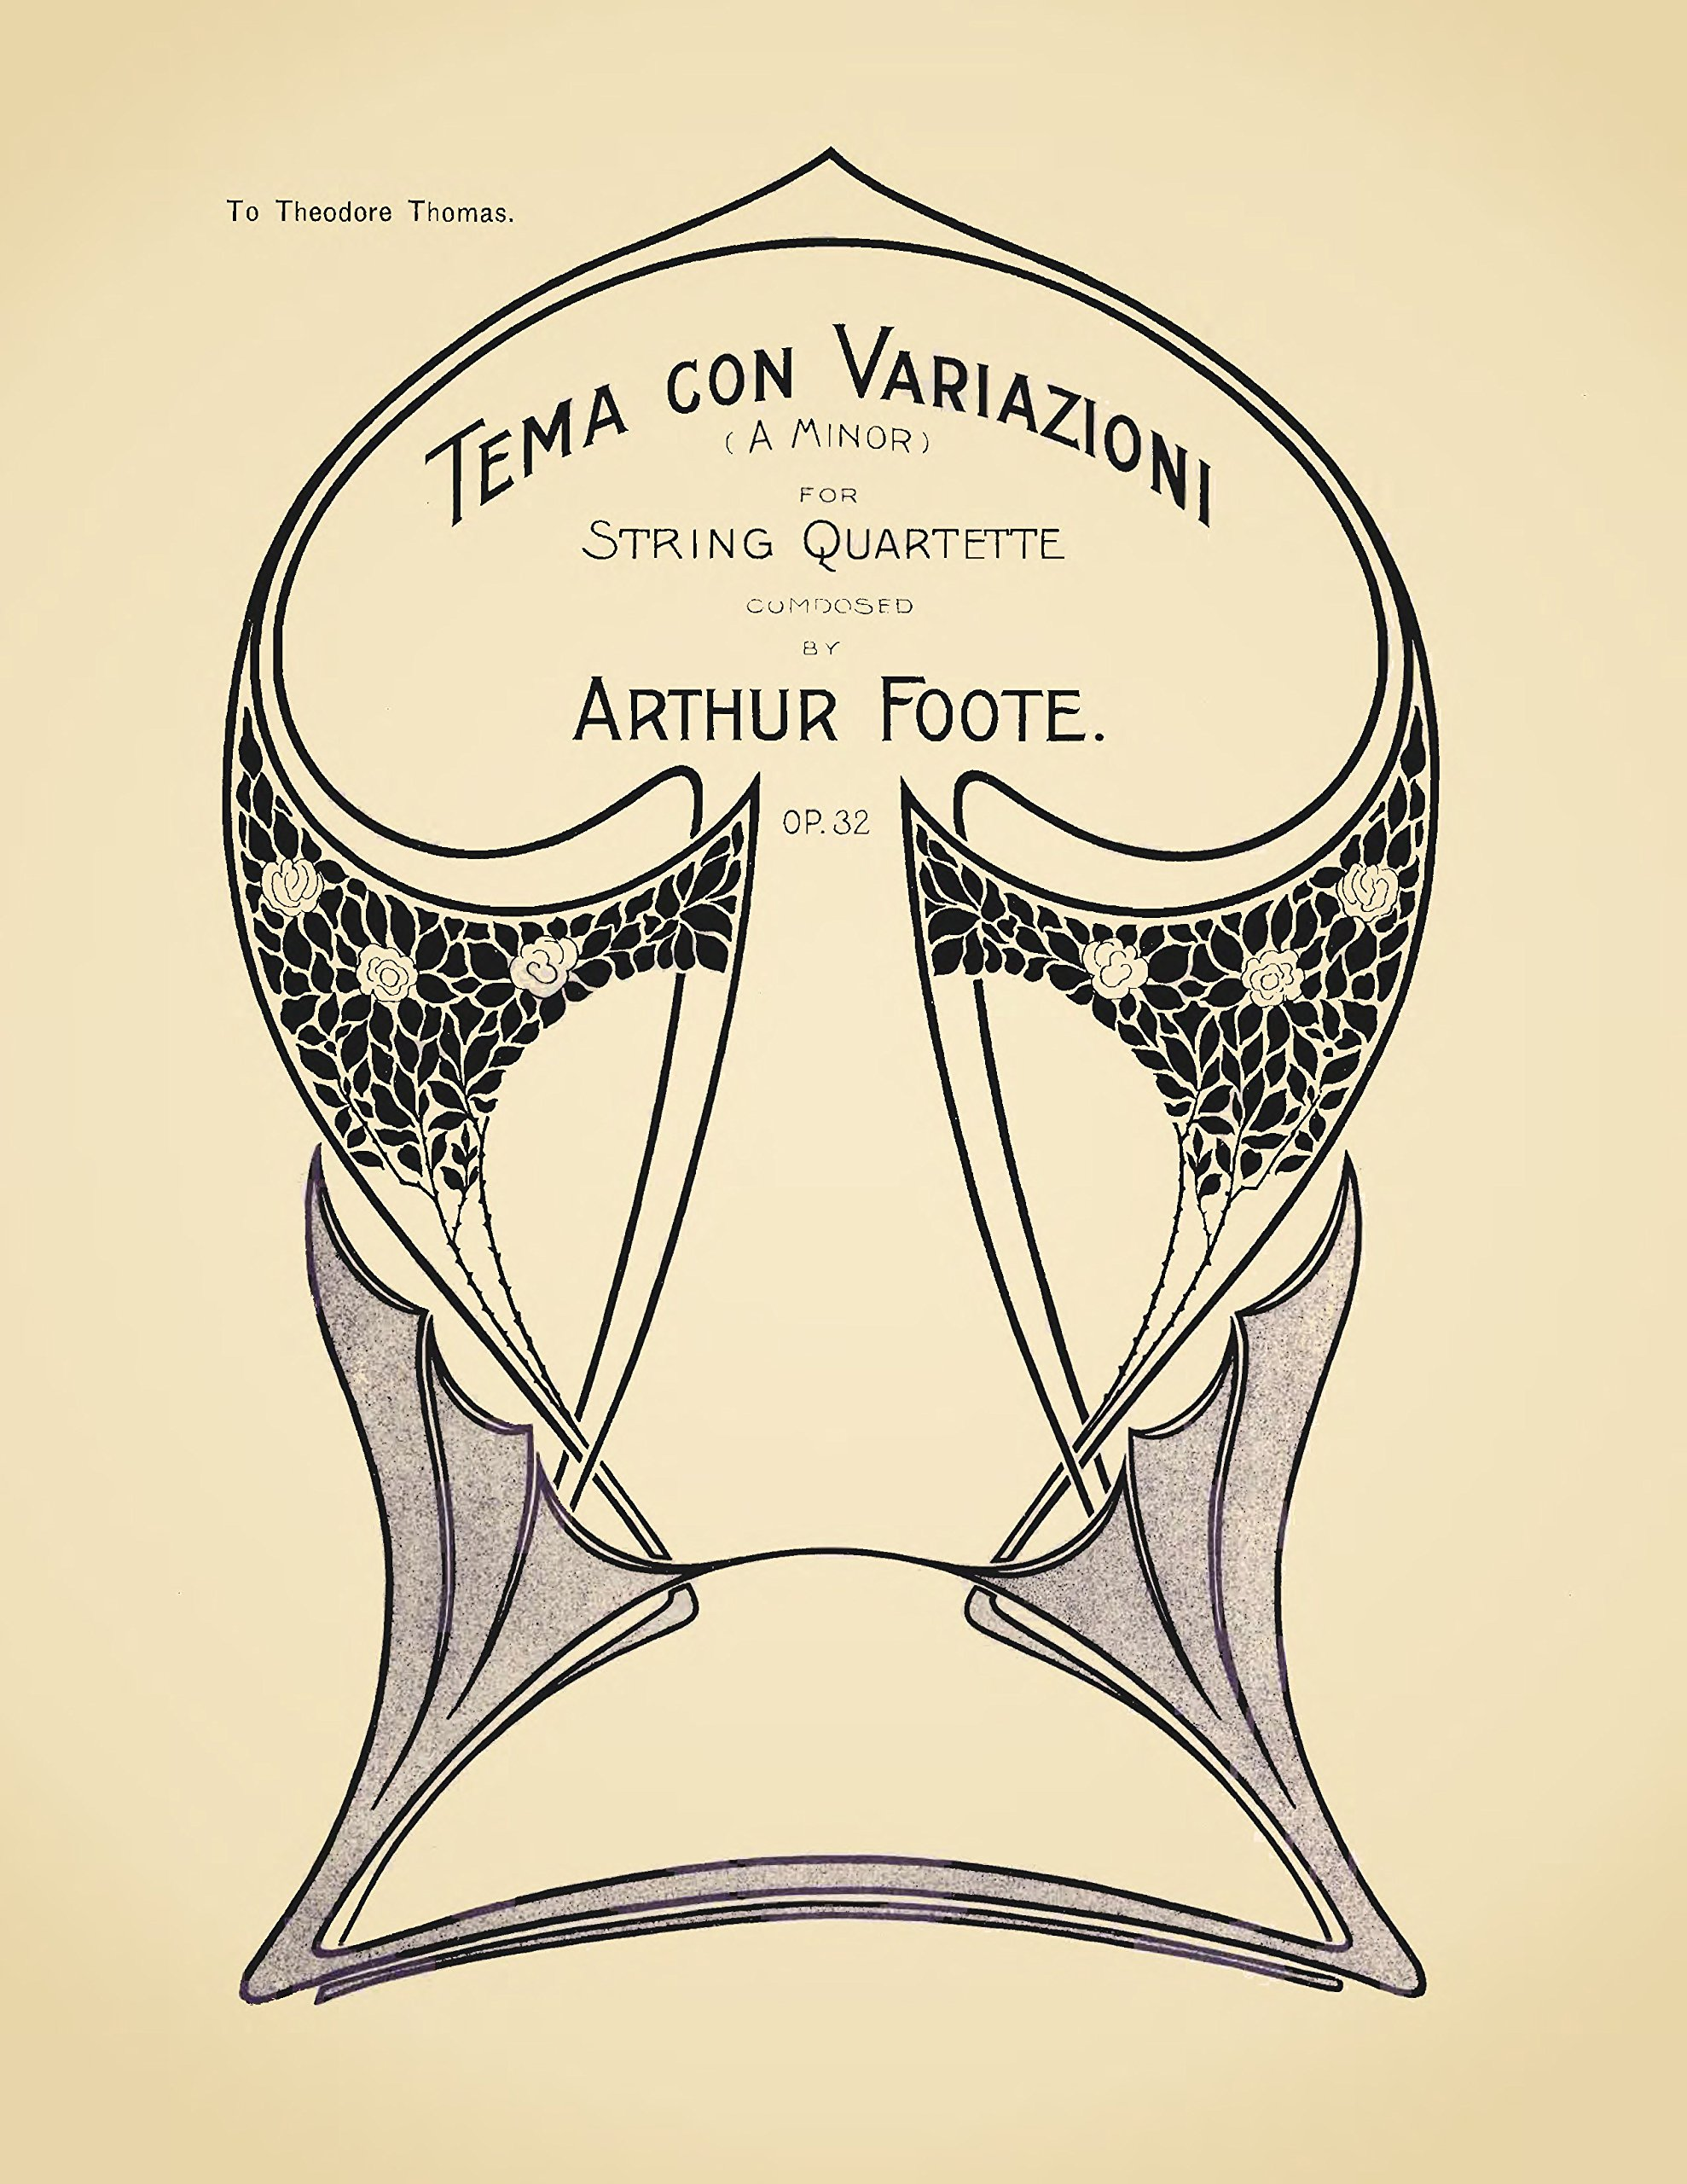 Foote, Arthur : Tema con variazioni (A minor) for string quartette, op. 32. ebook